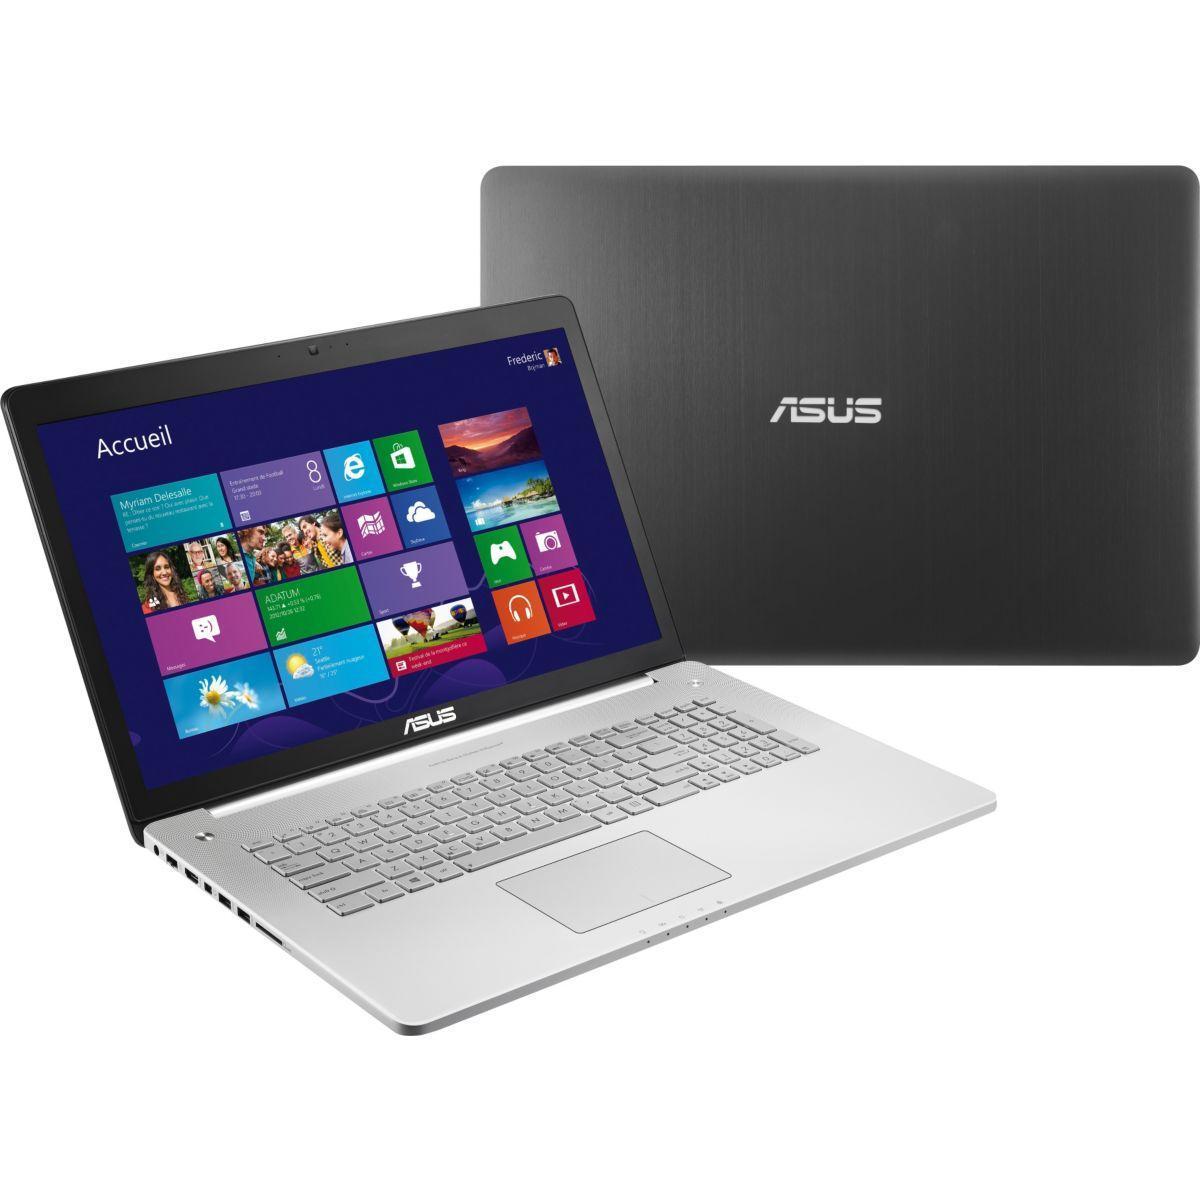 "Asus N750JV-T4048H 17,3"" Core i7-4700HQ 2,4 GHz  - SSD 256 Go + HDD 1.024 To - RAM 16 Go"